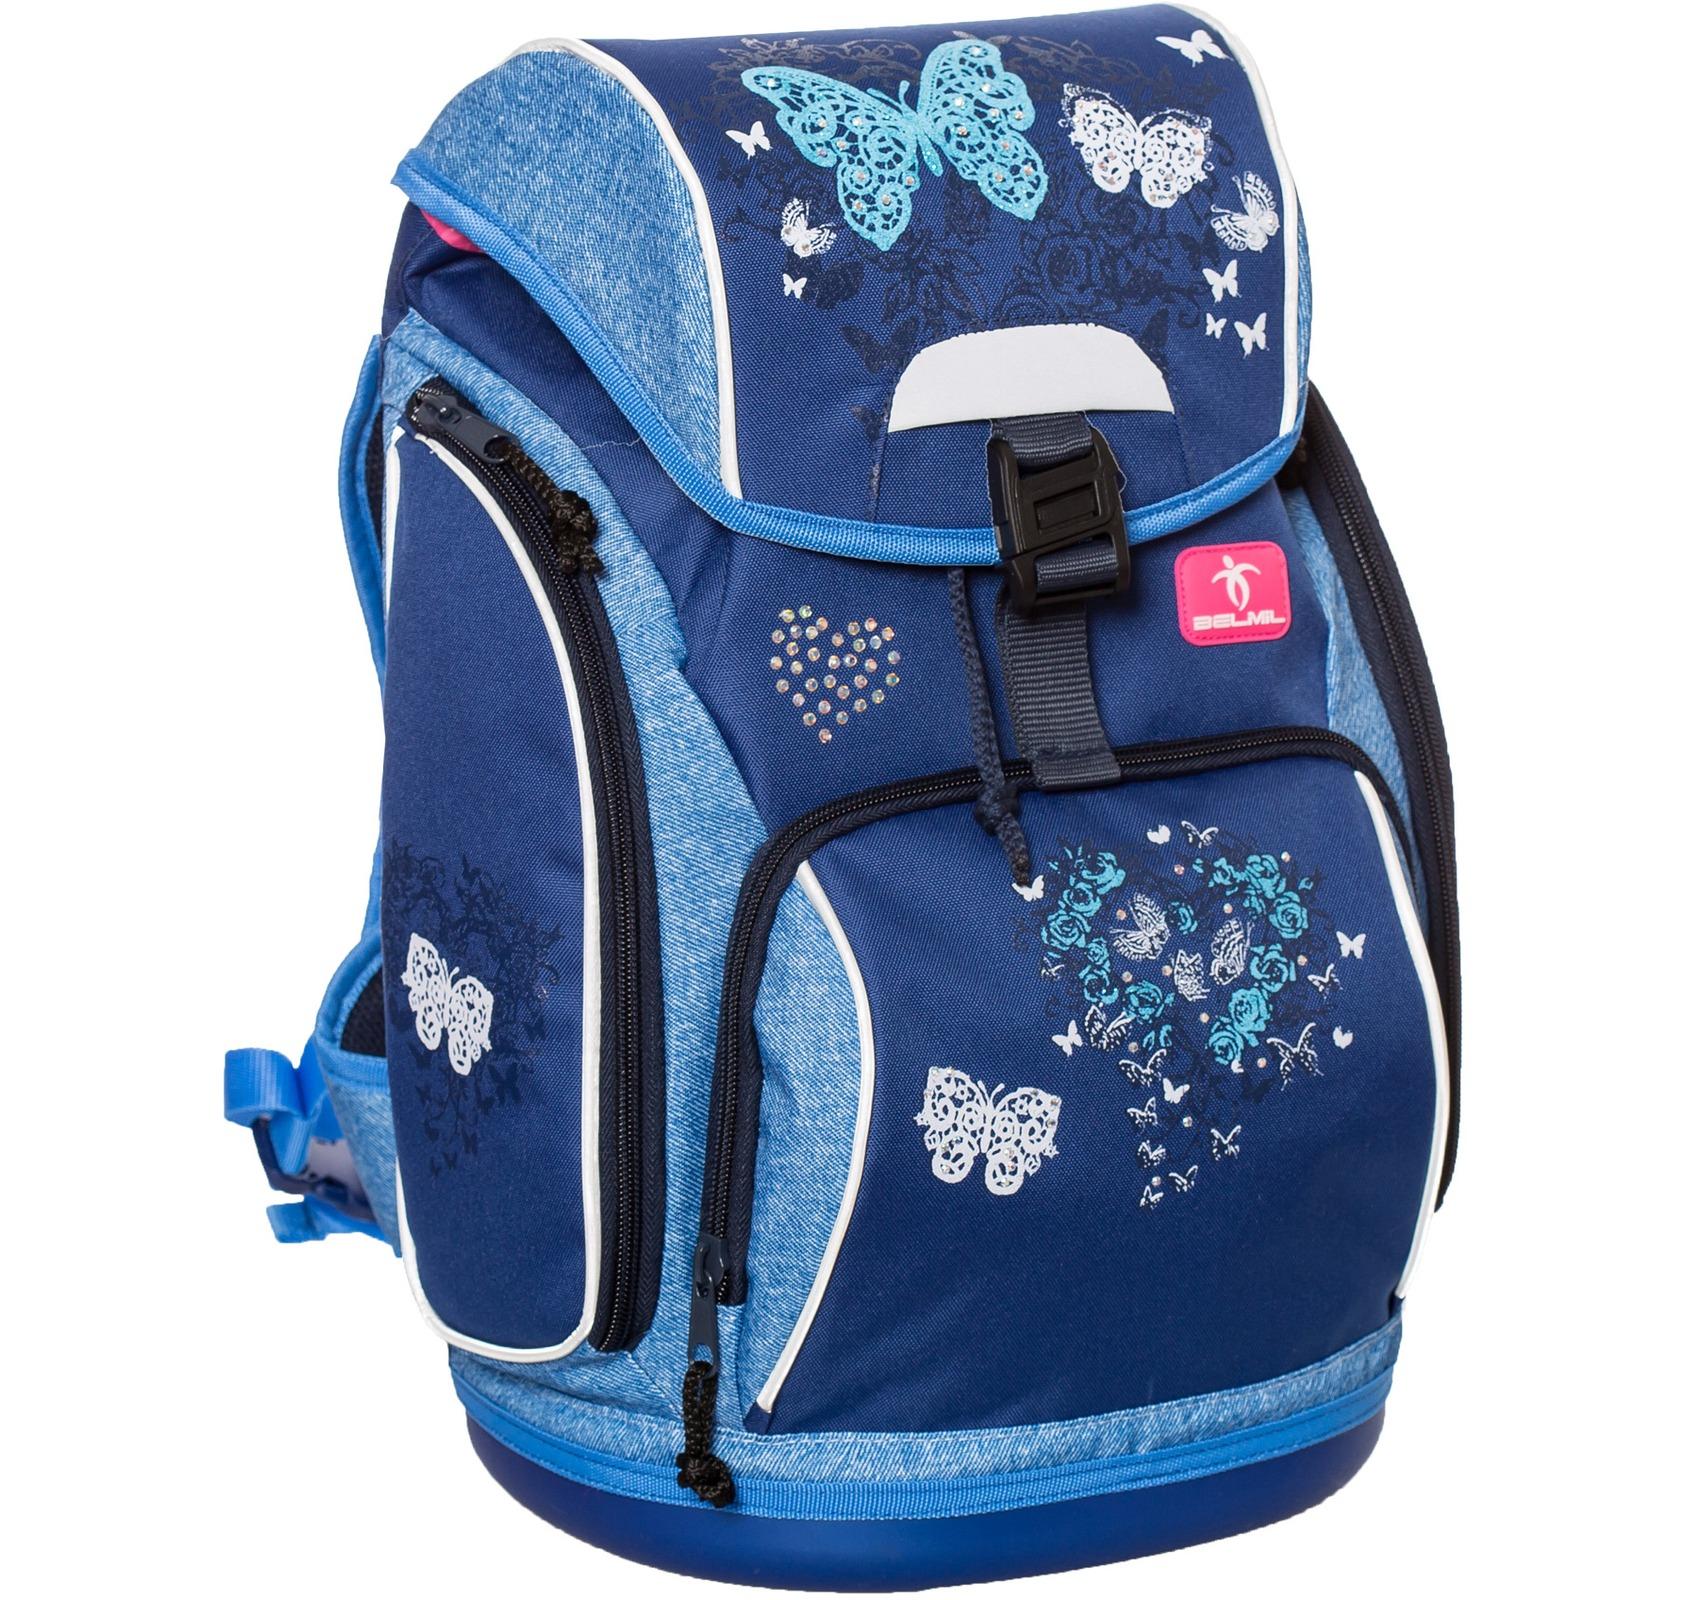 Ранец-рюкзак Belmil 404-31/467 цвет Butterfly Новинка, - фото 2